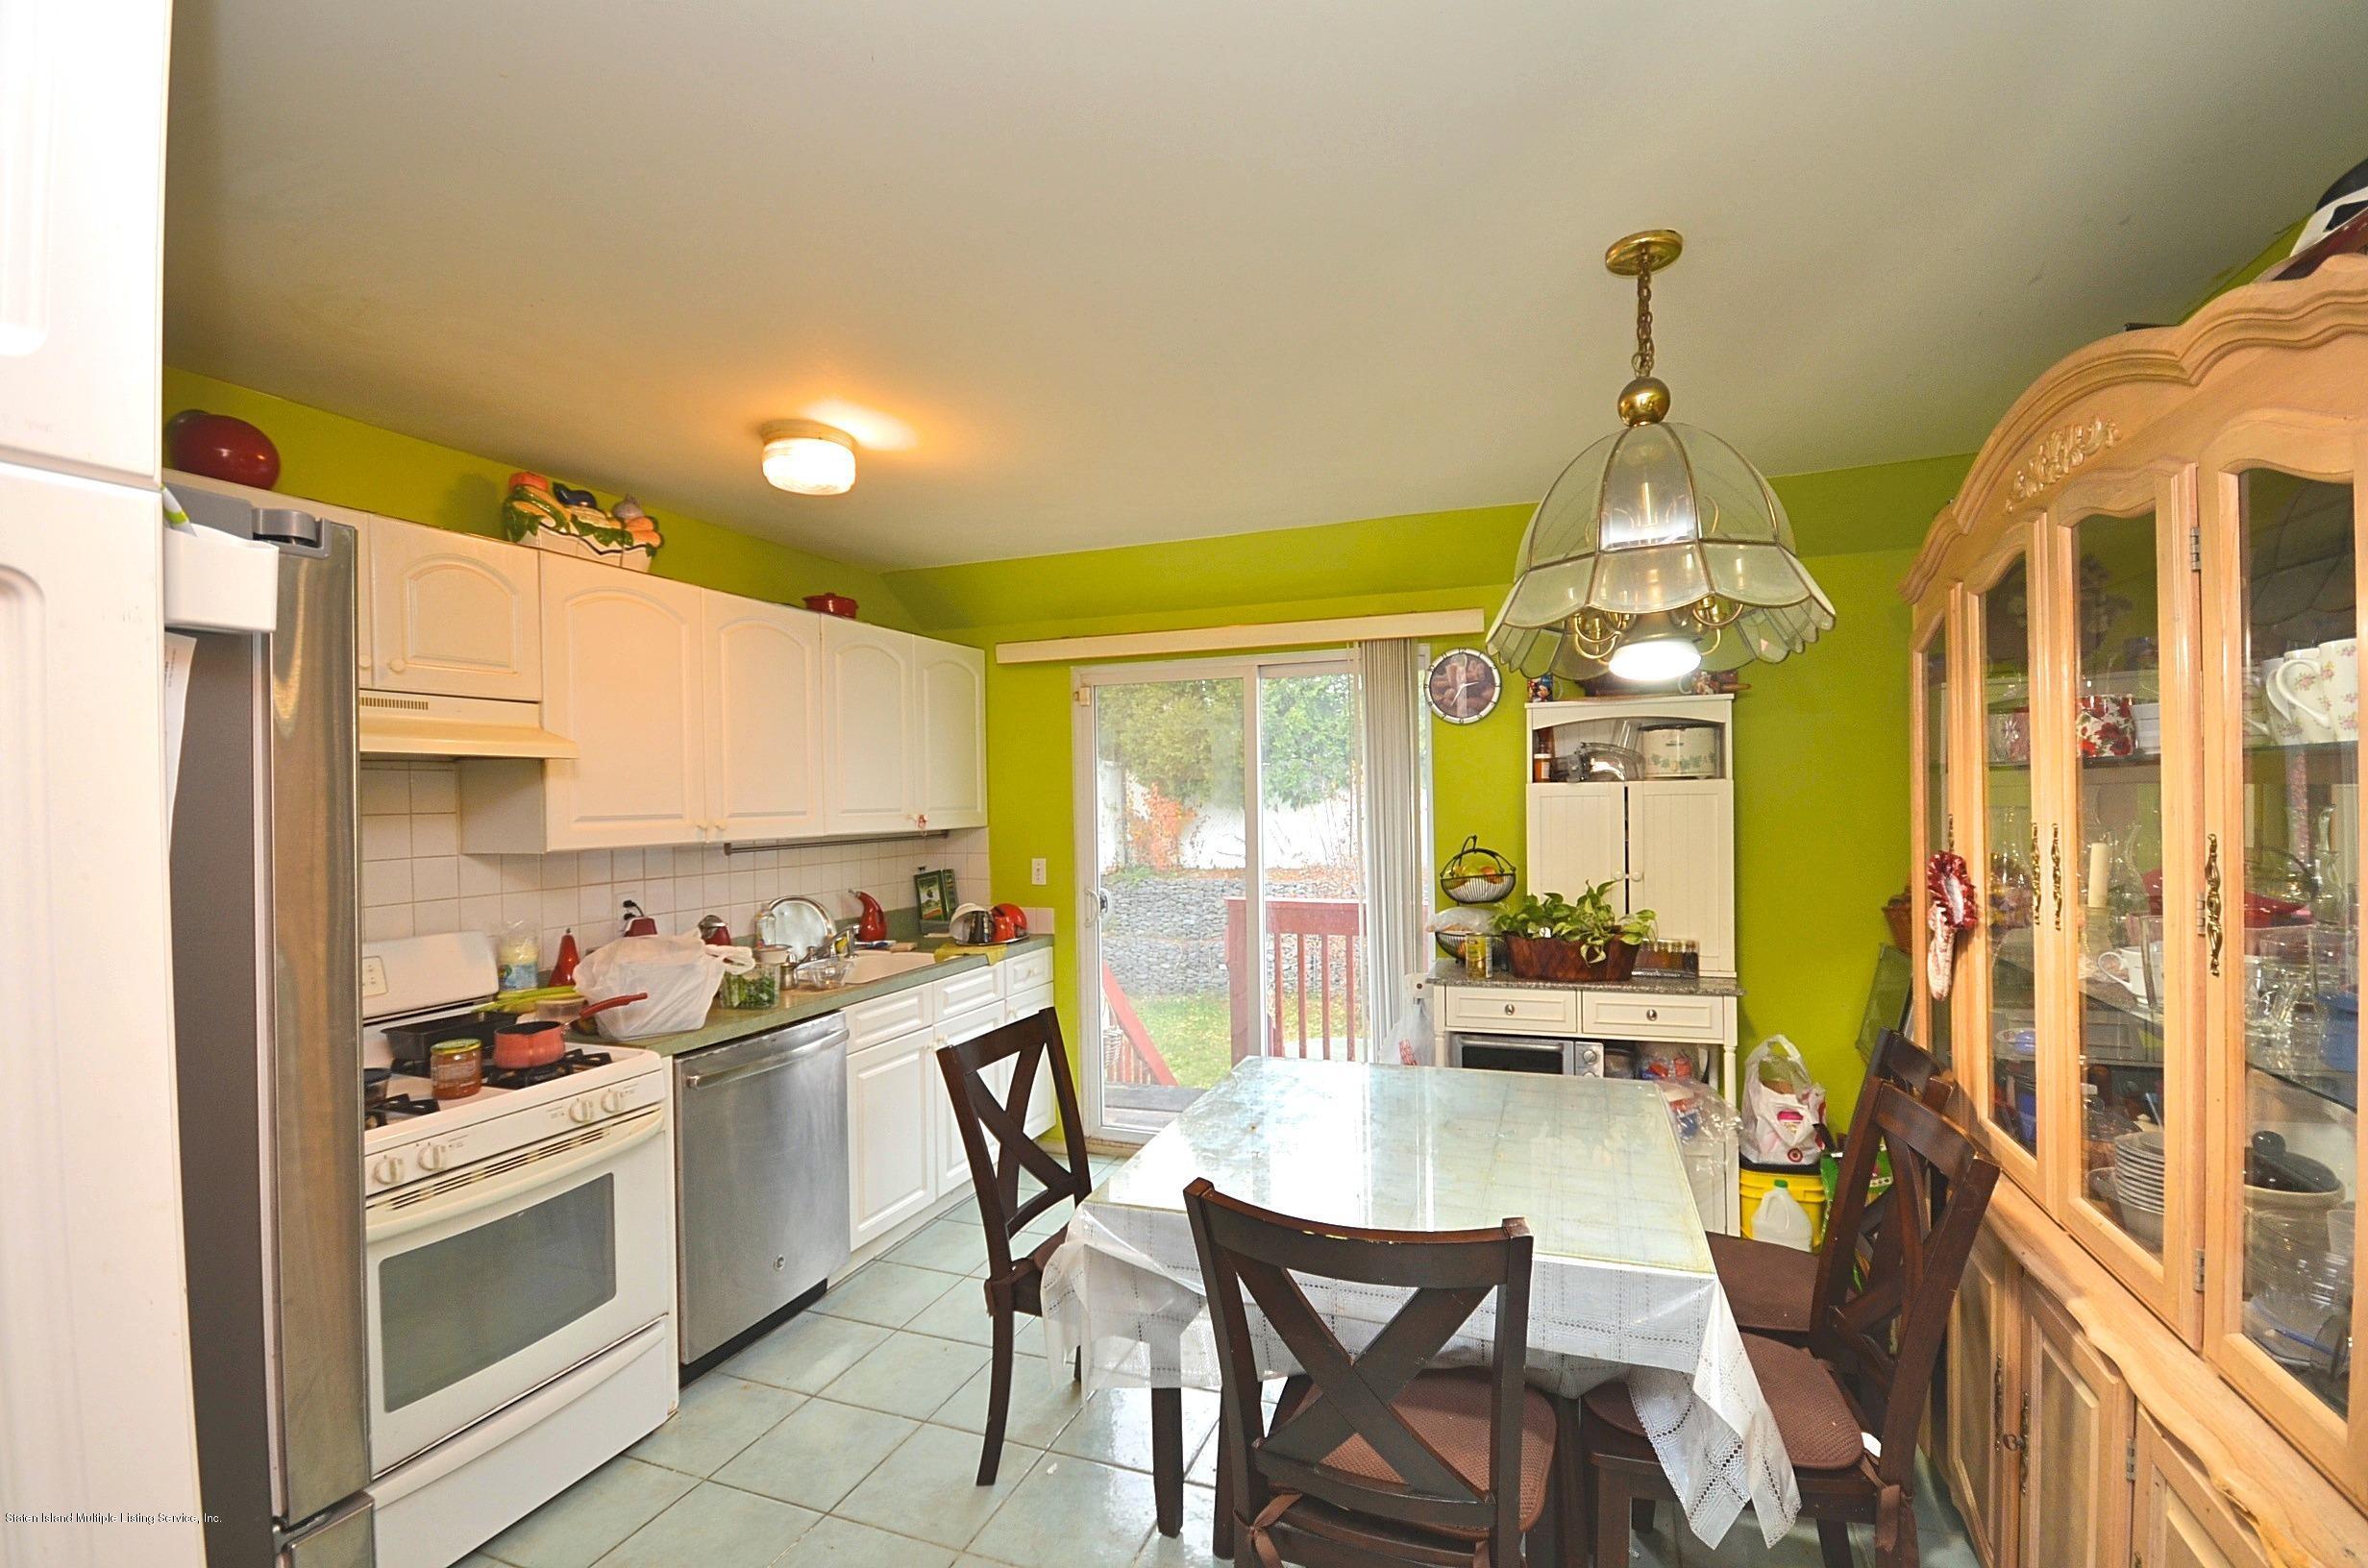 Single Family - Attached 200 Kenilworth Avenue  Staten Island, NY 10312, MLS-1124636-5